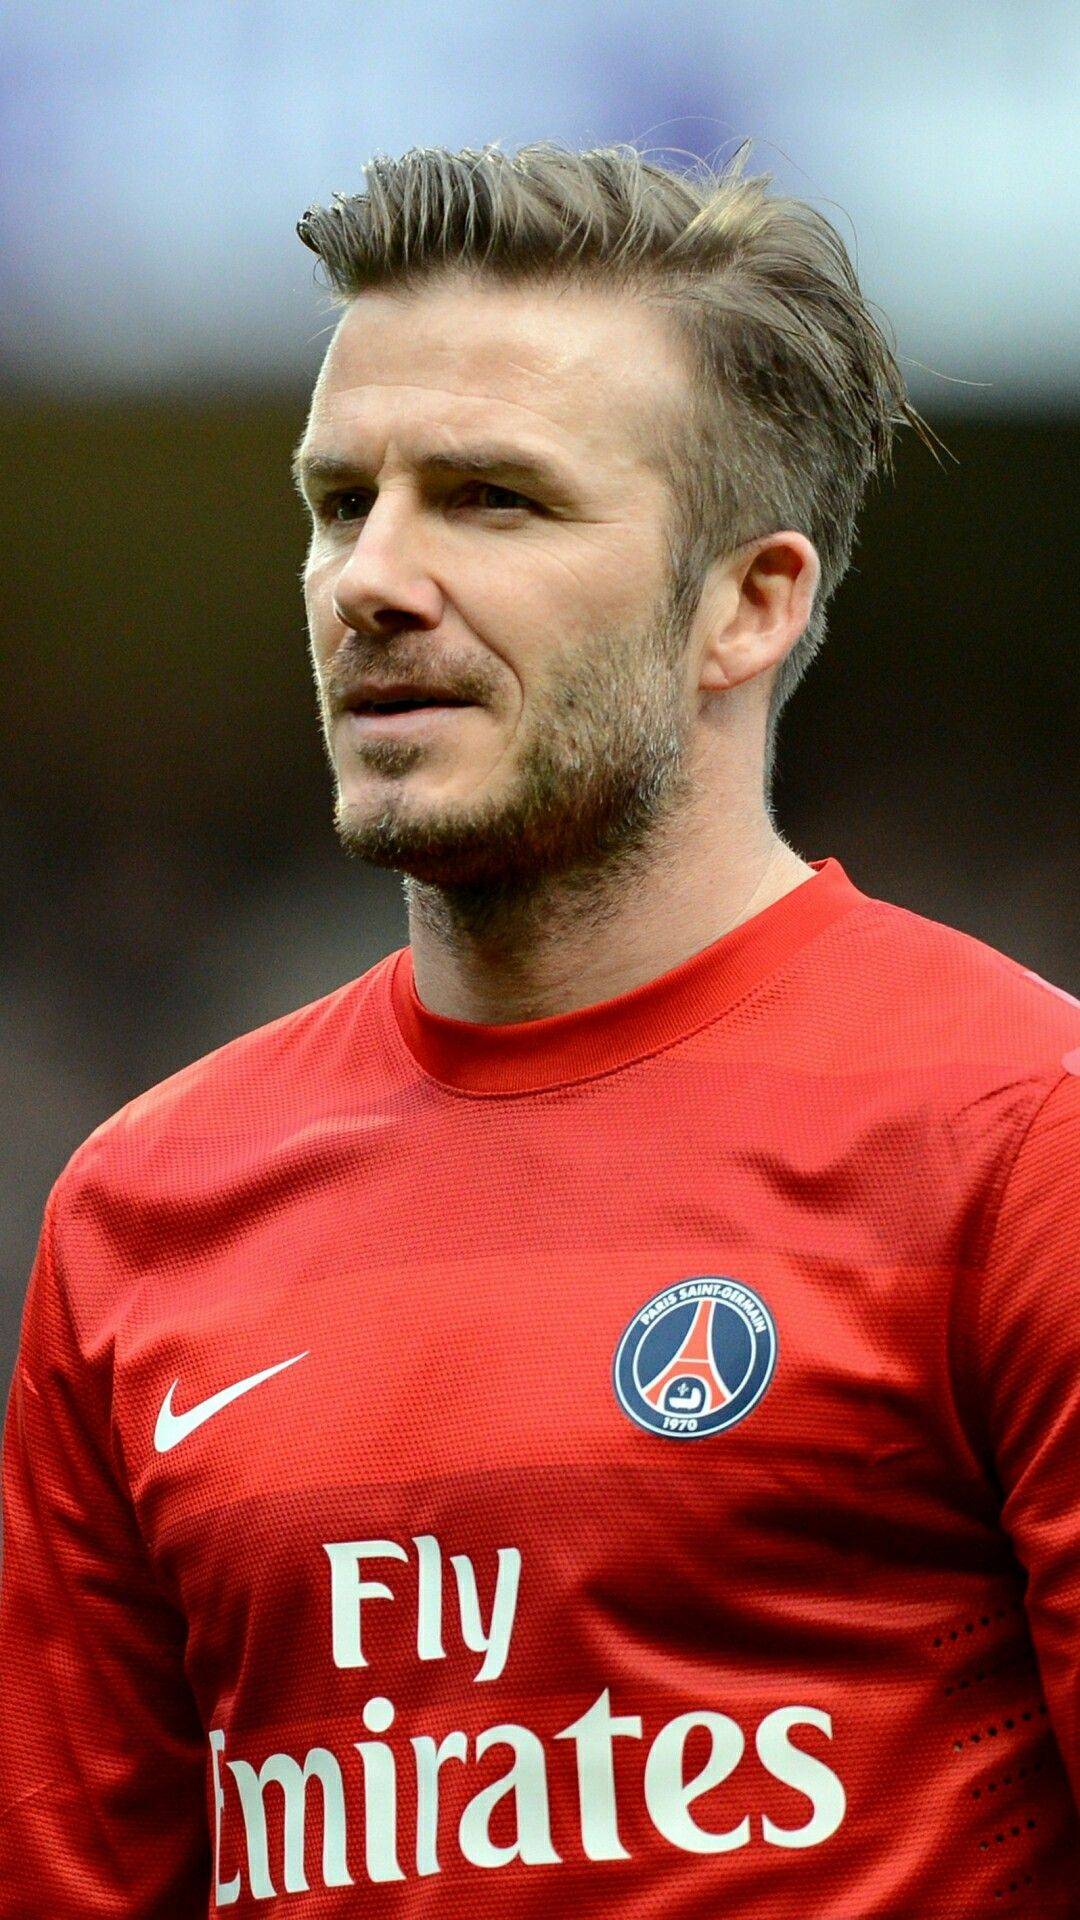 David Beckham (con imágenes) Leyendas